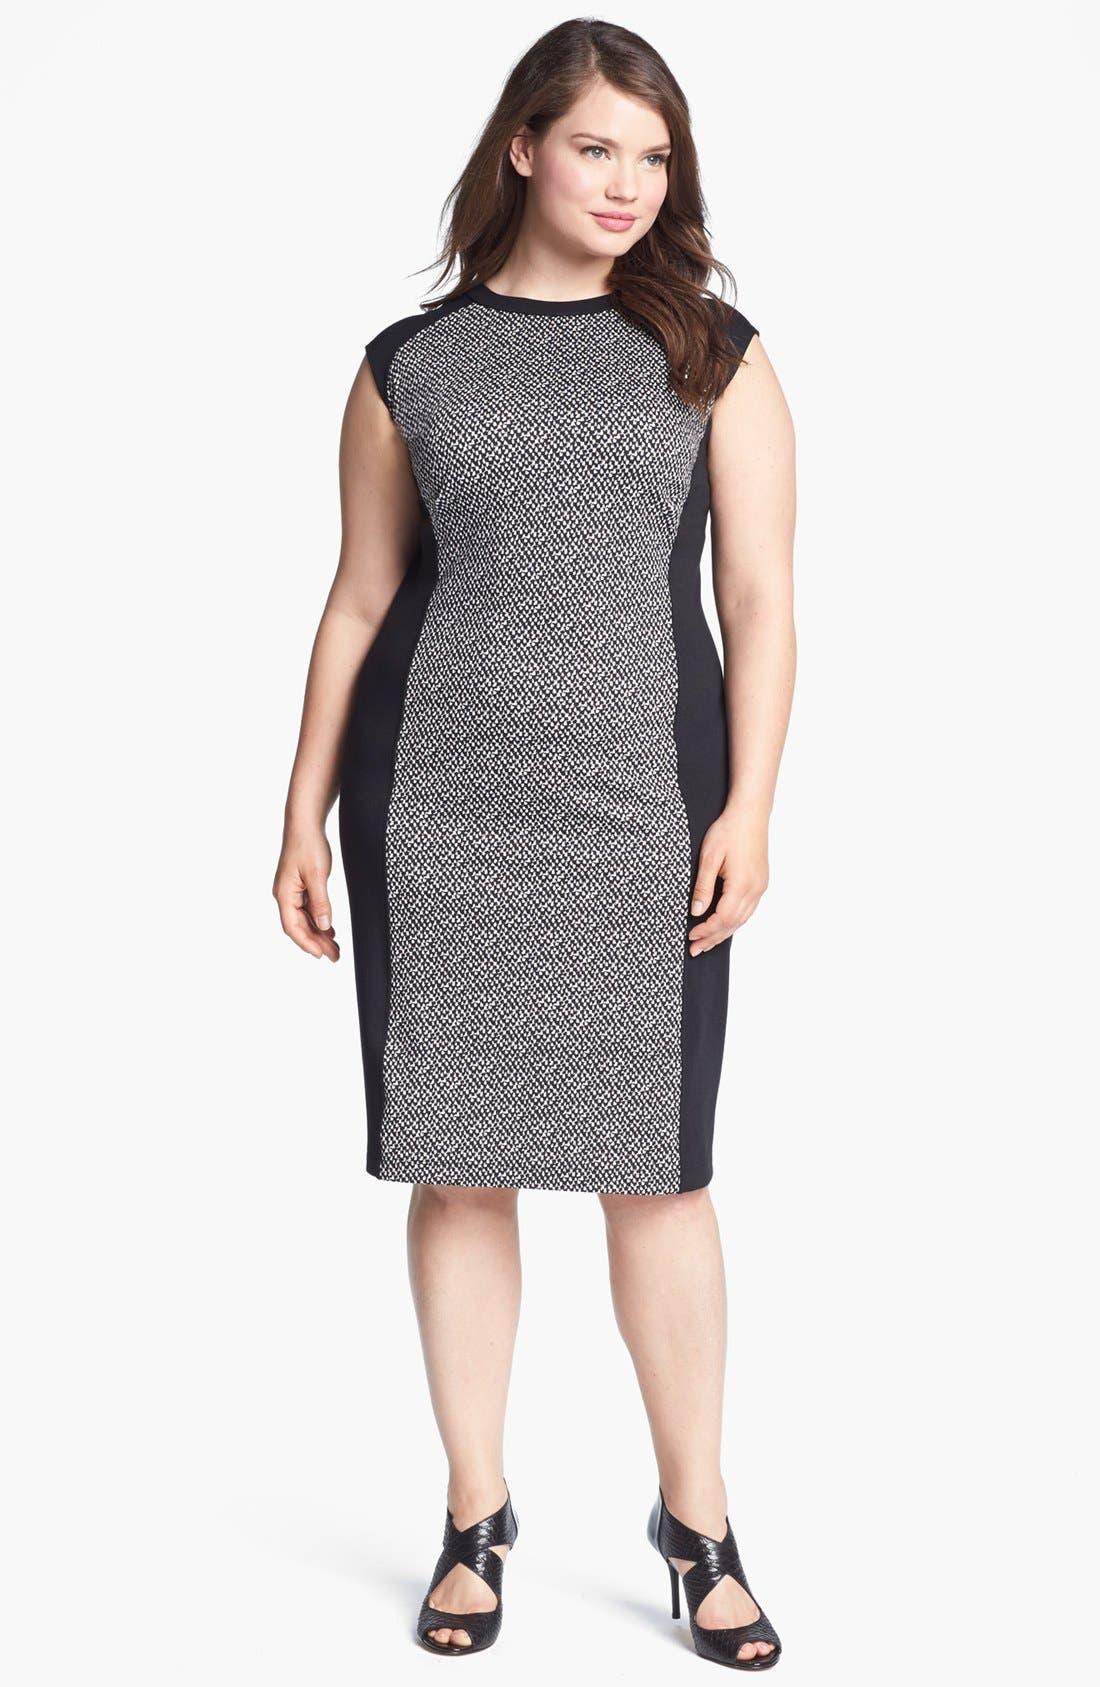 Alternate Image 1 Selected - Calvin Klein Colorblock Ponte Sheath Dress (Plus Size) (Online Only)